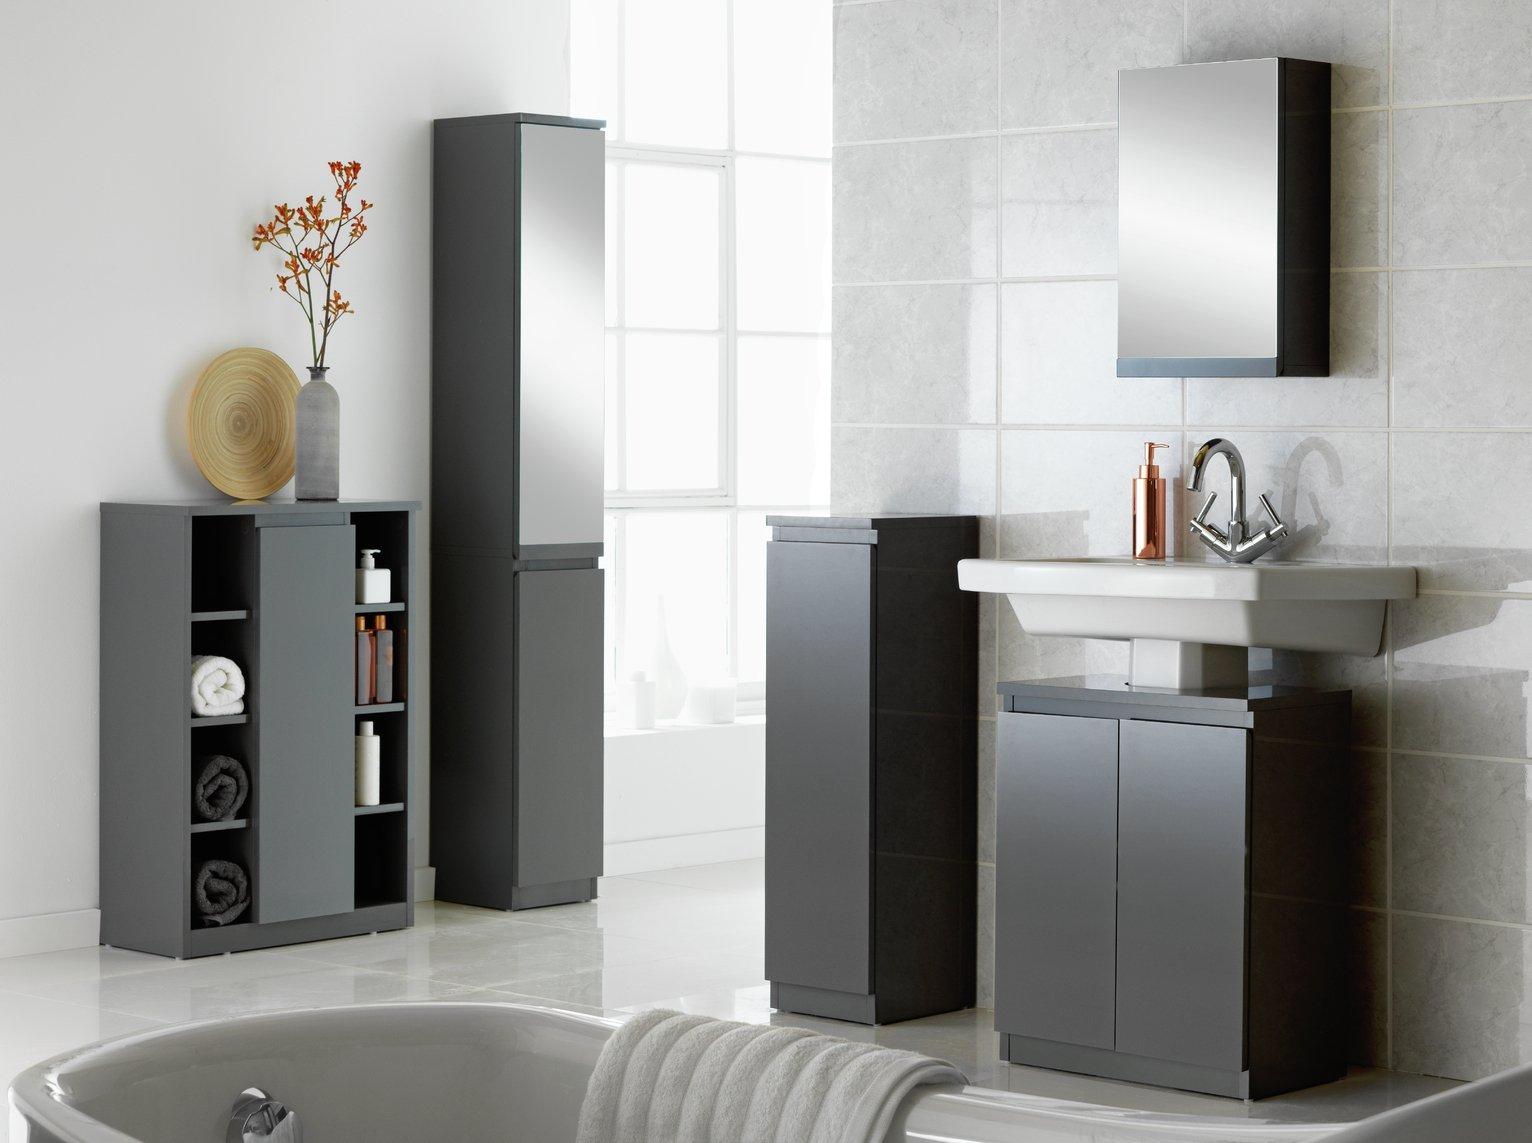 Buy Argos Home Gloss Mirror Tall Bathroom Storage Cabinet Grey